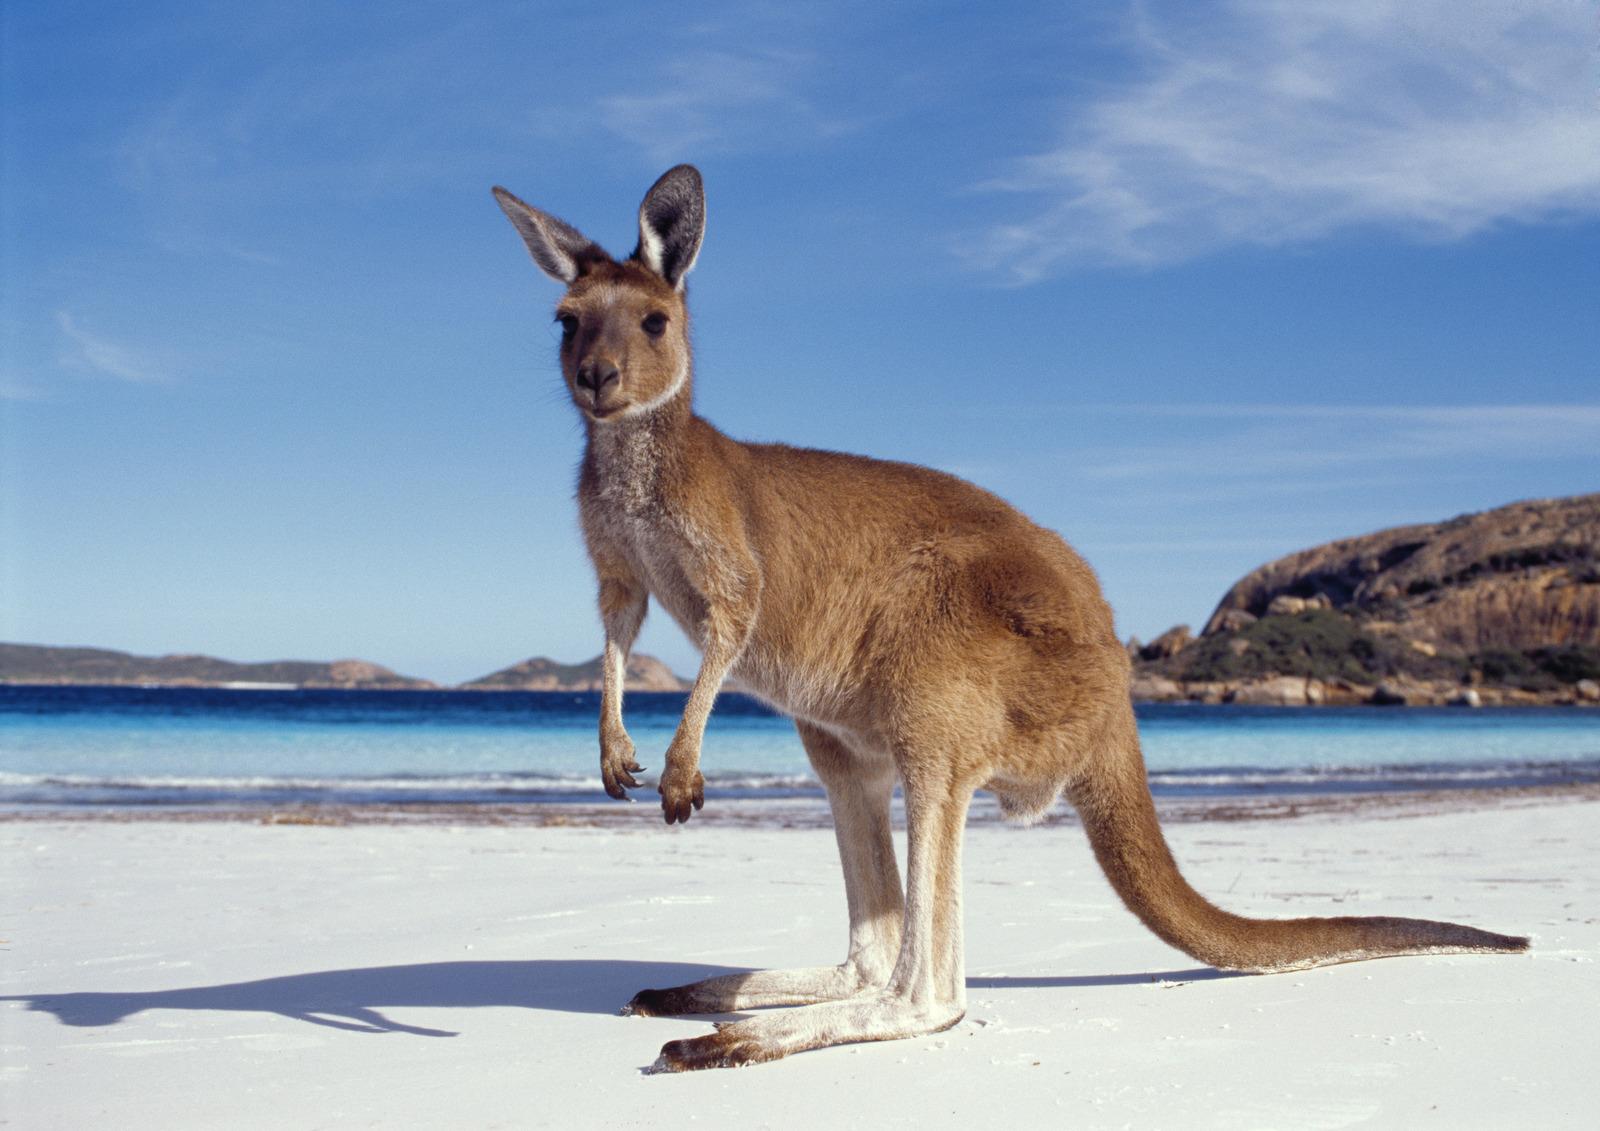 Kangaroo - Australia Bucket List